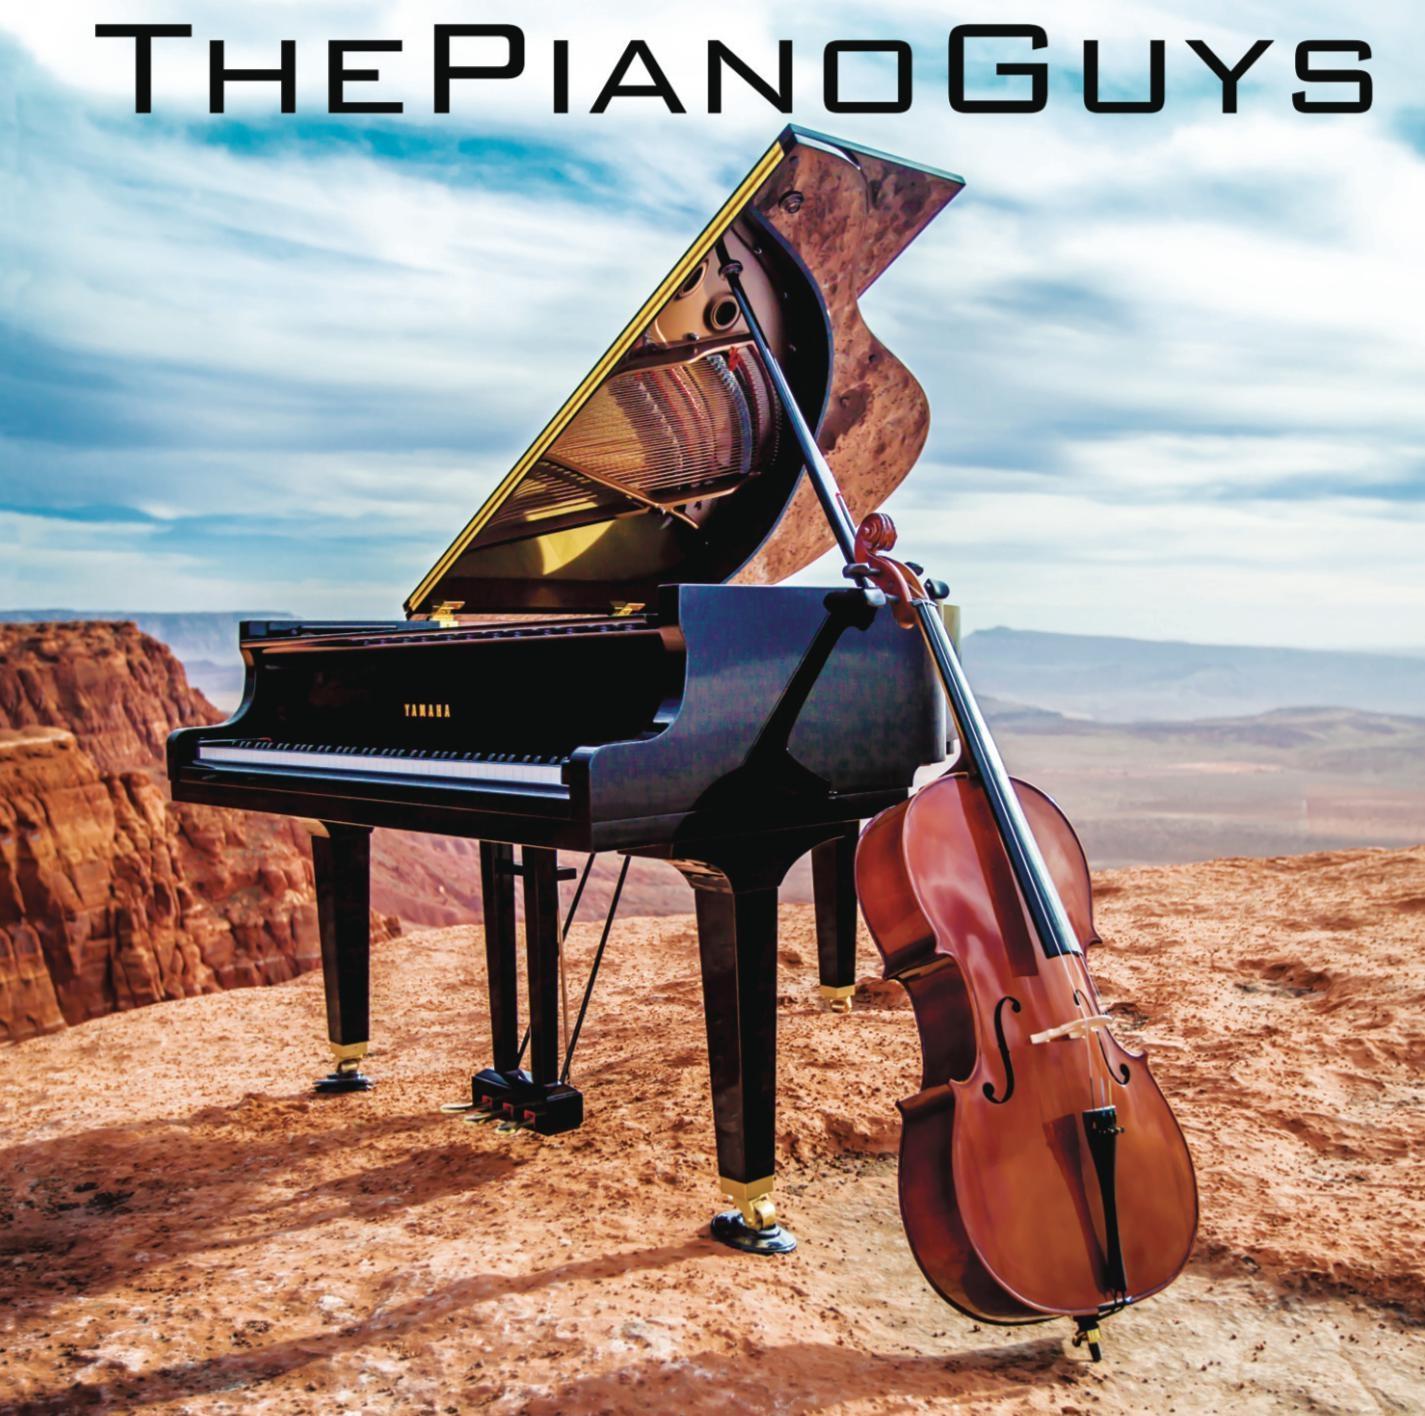 http://4.bp.blogspot.com/-l8r_fShQb0U/UI8pGAYZtsI/AAAAAAAAFuw/7p--ZyPa2Bs/s1600/The+Piano+Guys.jpg